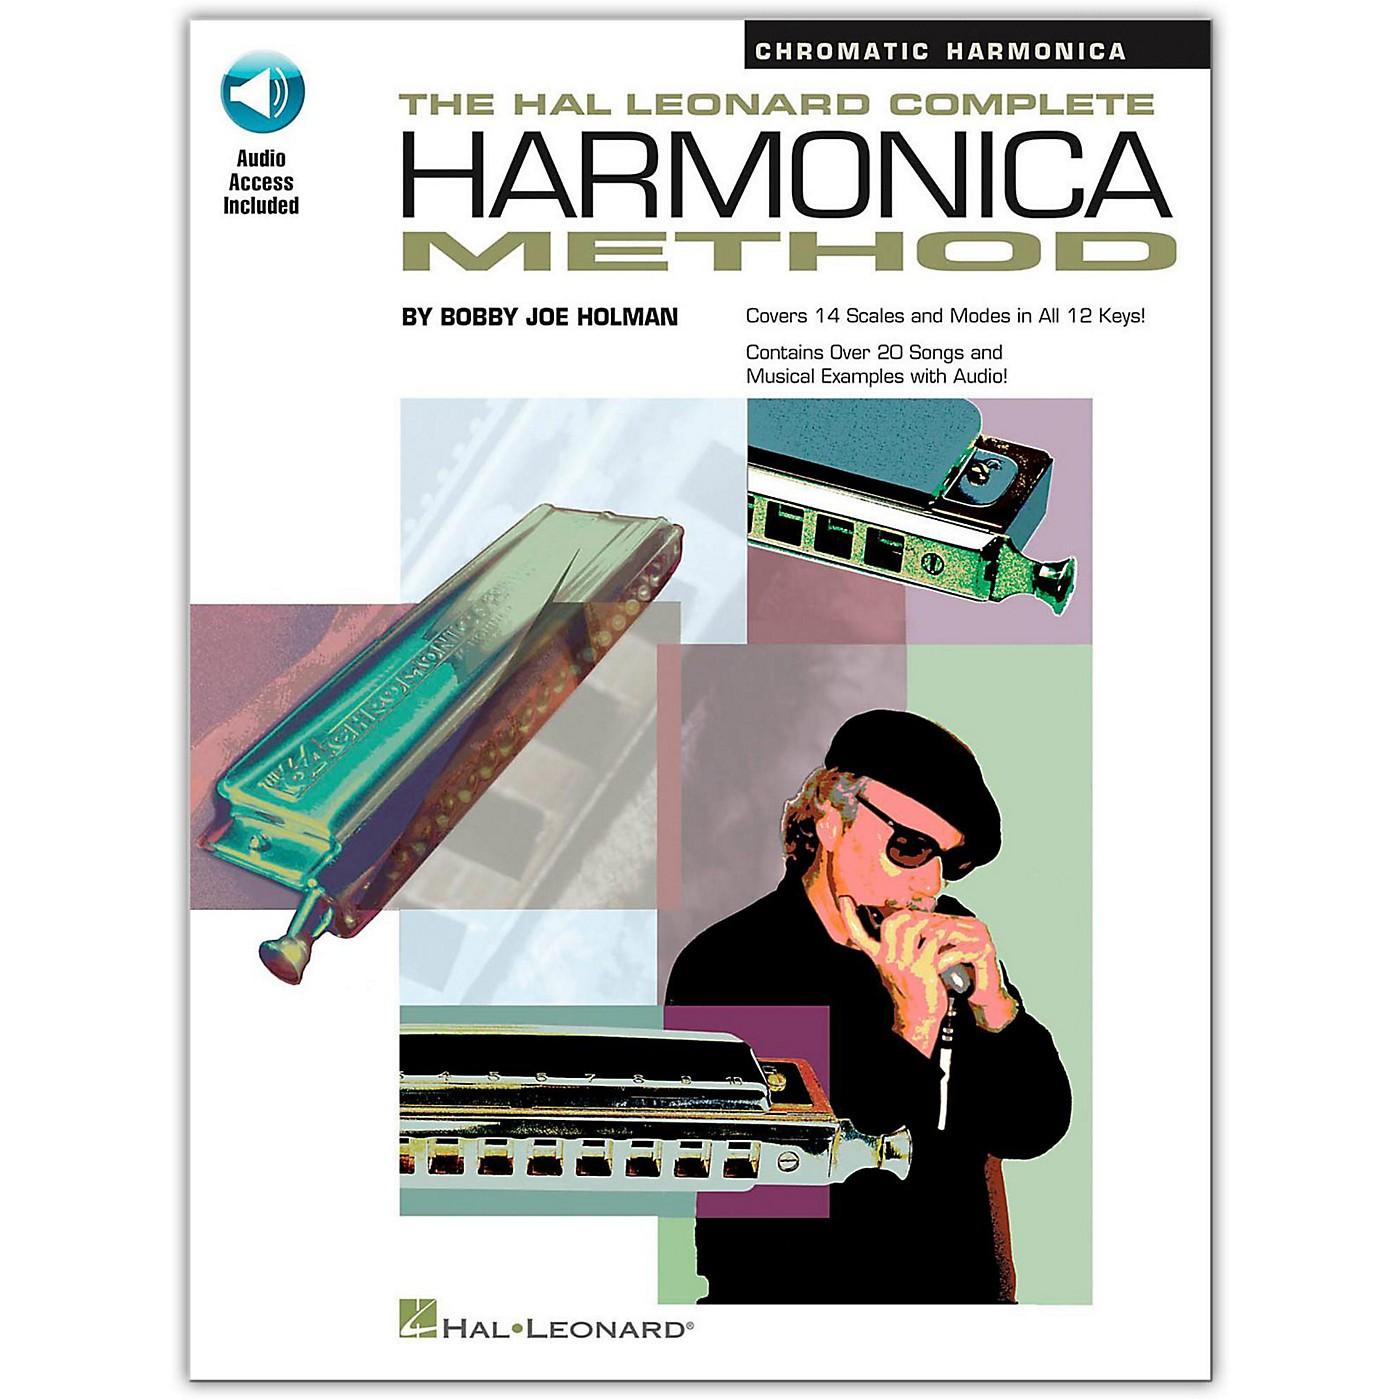 Hal Leonard Complete Harmonica Method - Chromatic Harmonica (Book/Online Audio) thumbnail